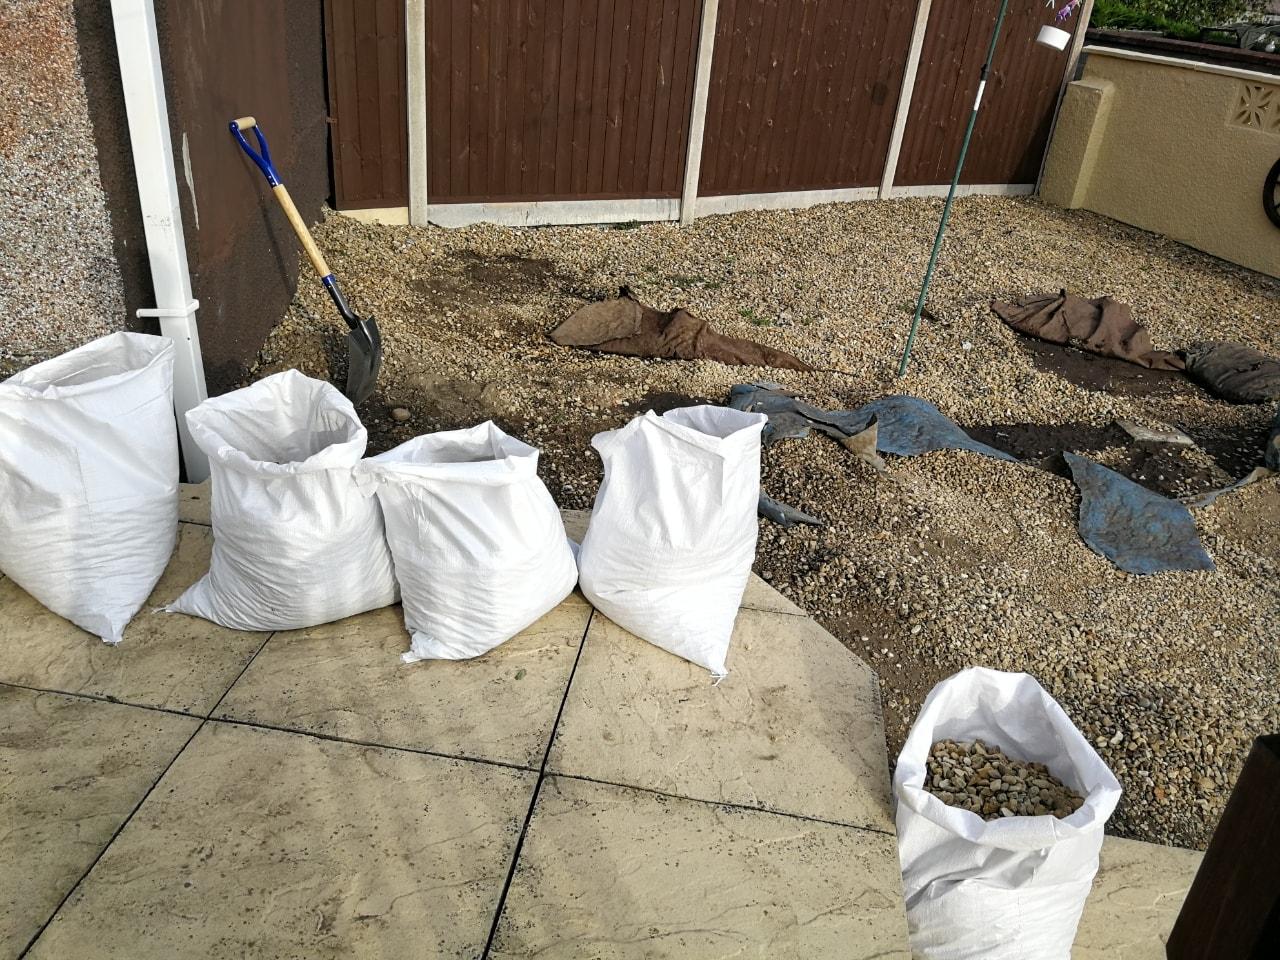 Bags of gravel